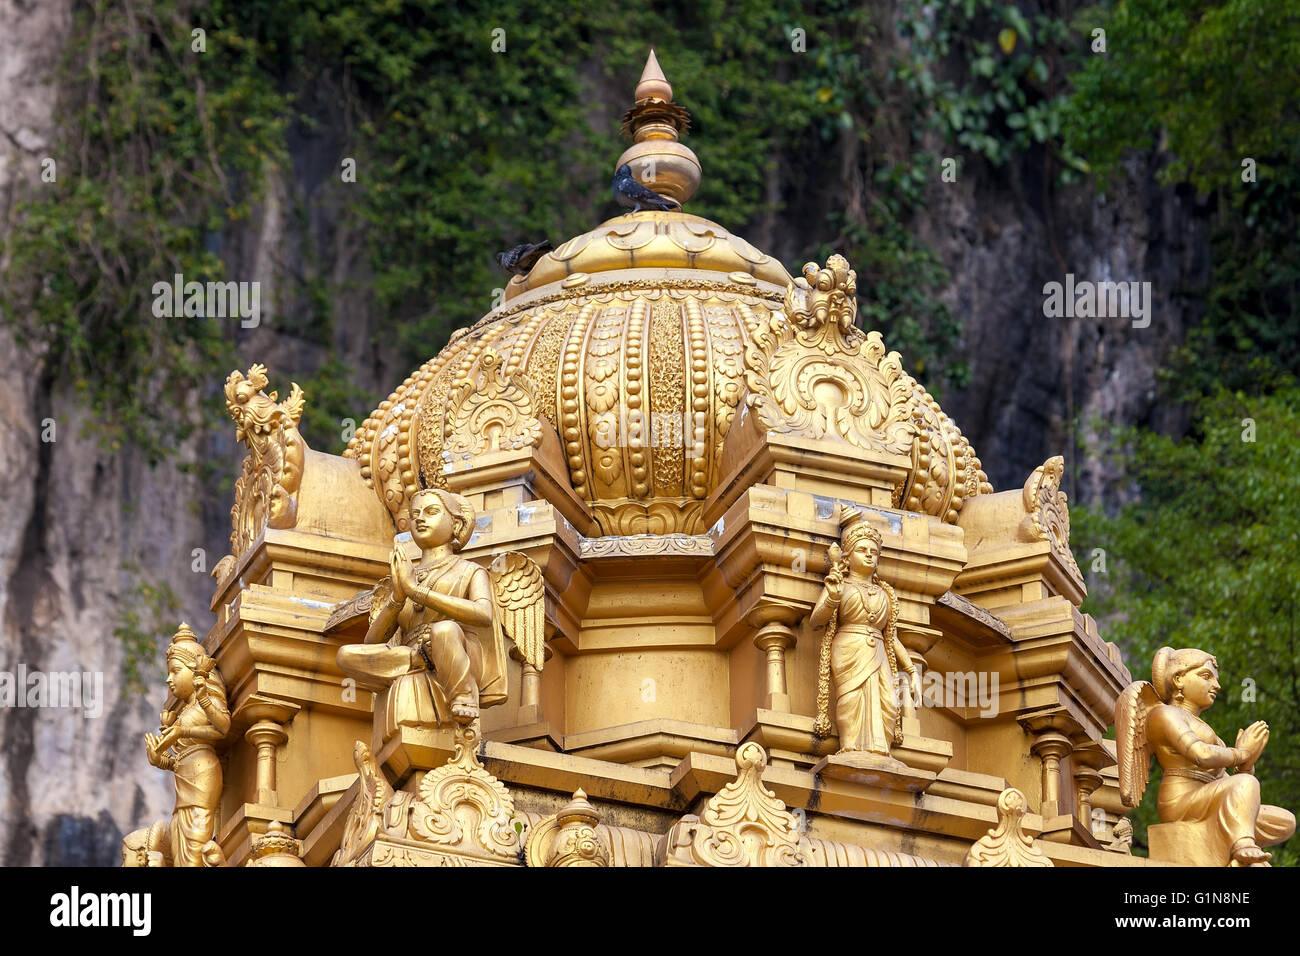 Sri Subramaniar Hindu Temple Gold Dome Architectural Detail at Batu Caves in Malaysia - Stock Image